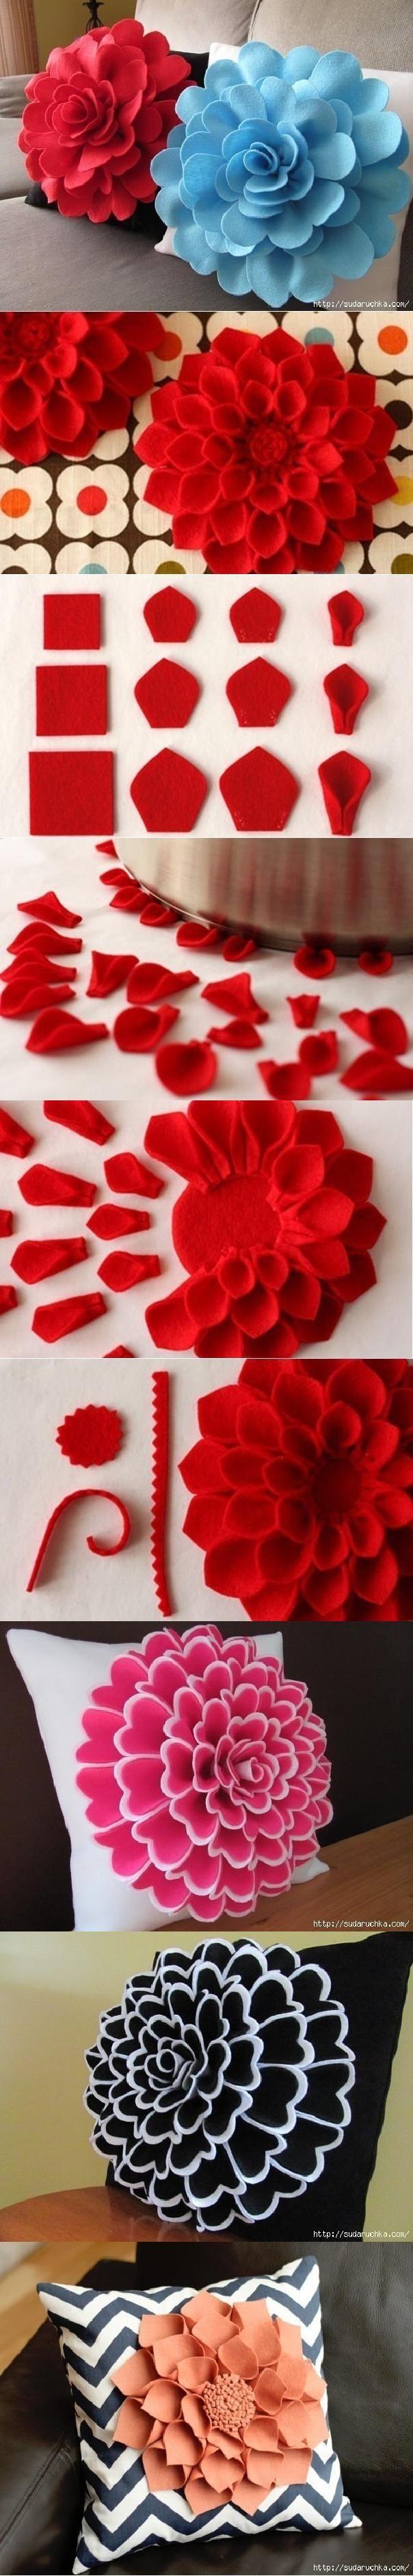 DIY Decorative Felt Flower Pillow Pictures, Photos, and ...